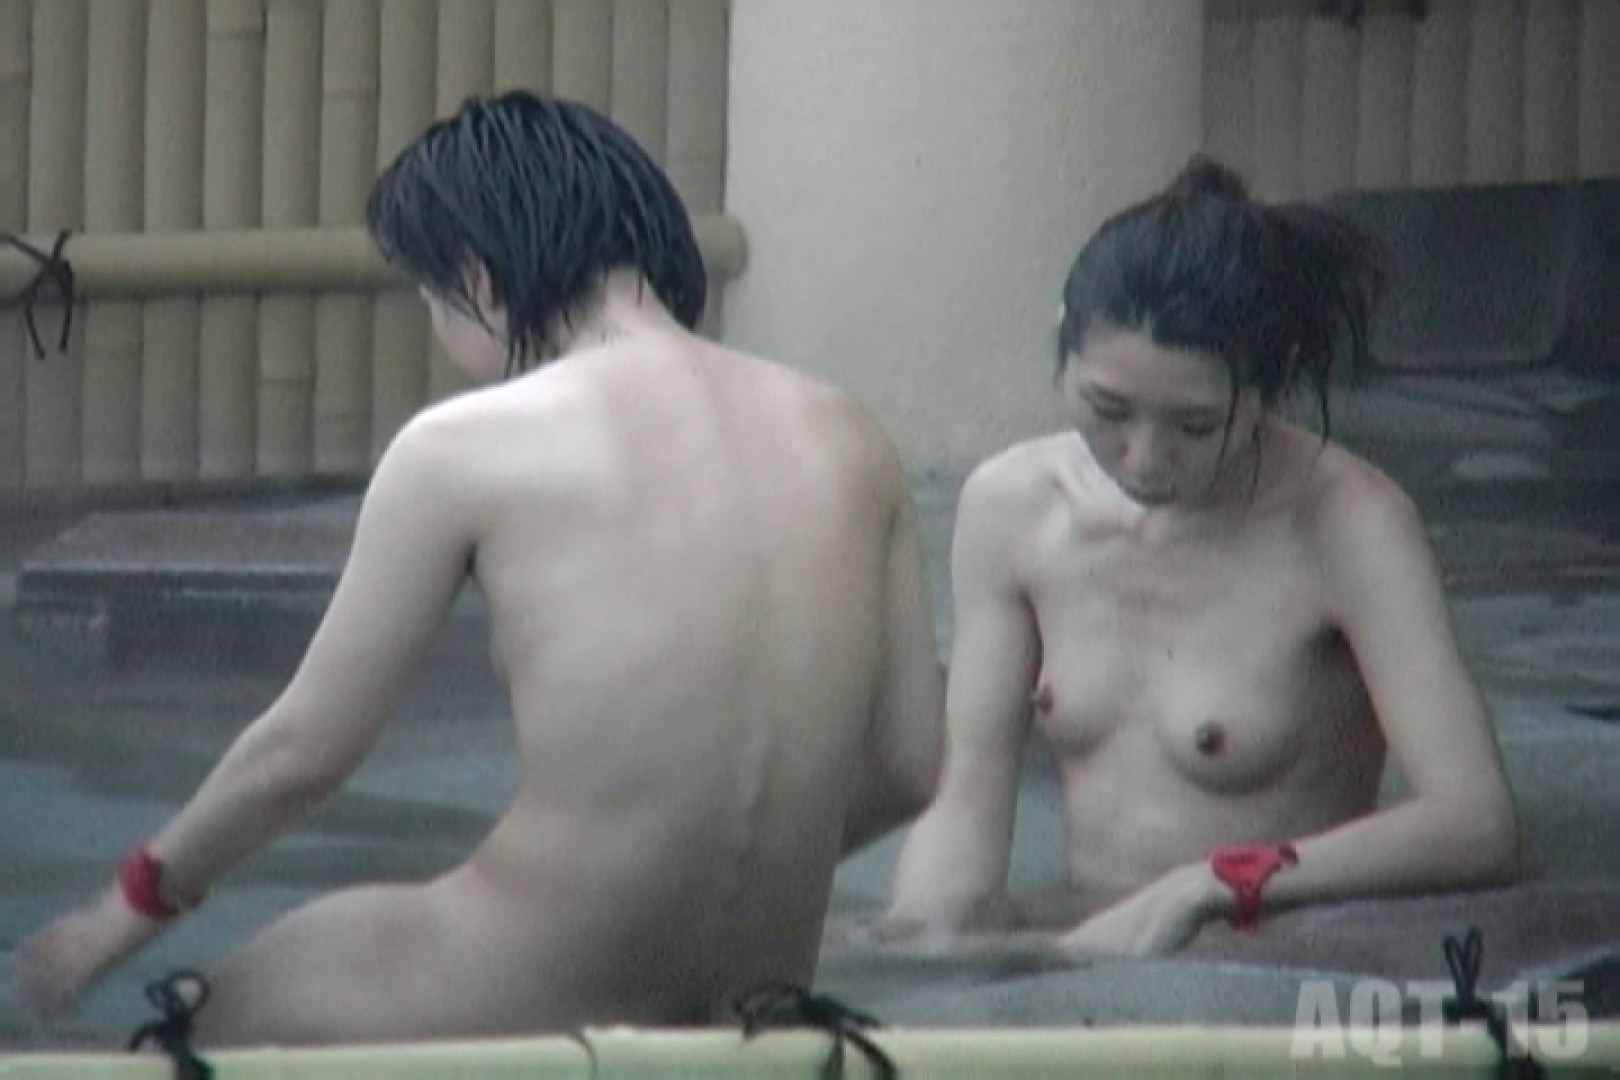 Aquaな露天風呂Vol.837 美しいOLの裸体 おめこ無修正画像 100pic 92